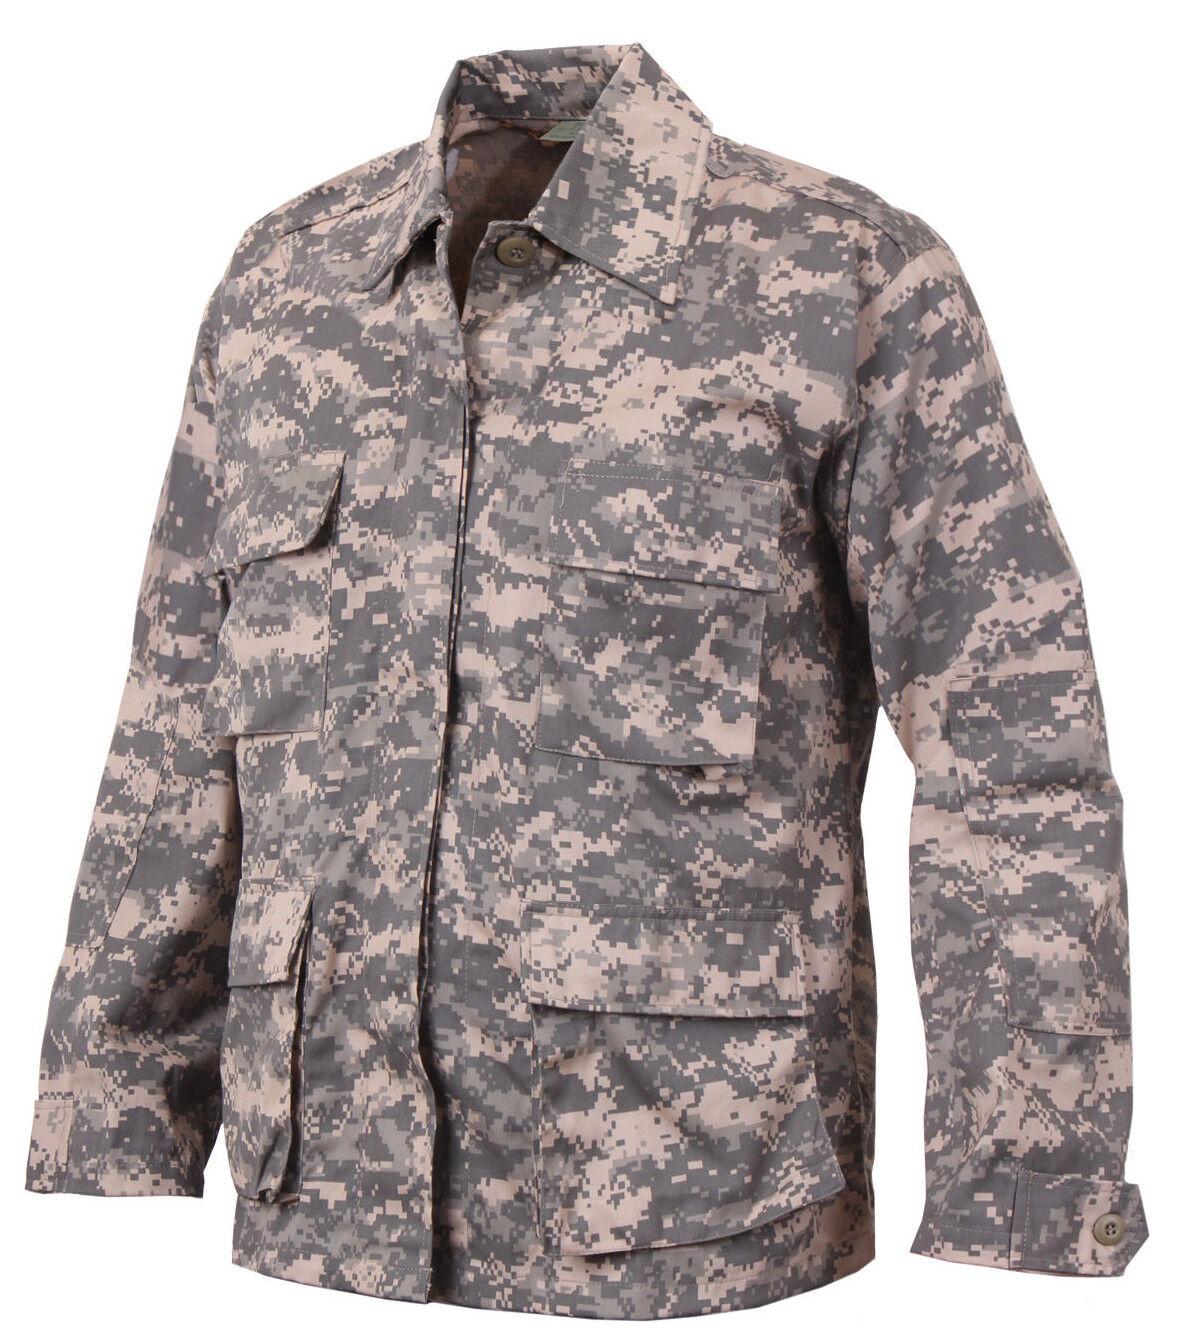 Army ACU Digital Camo BDU Shirt Military Style Uniform Coat redhco 8695